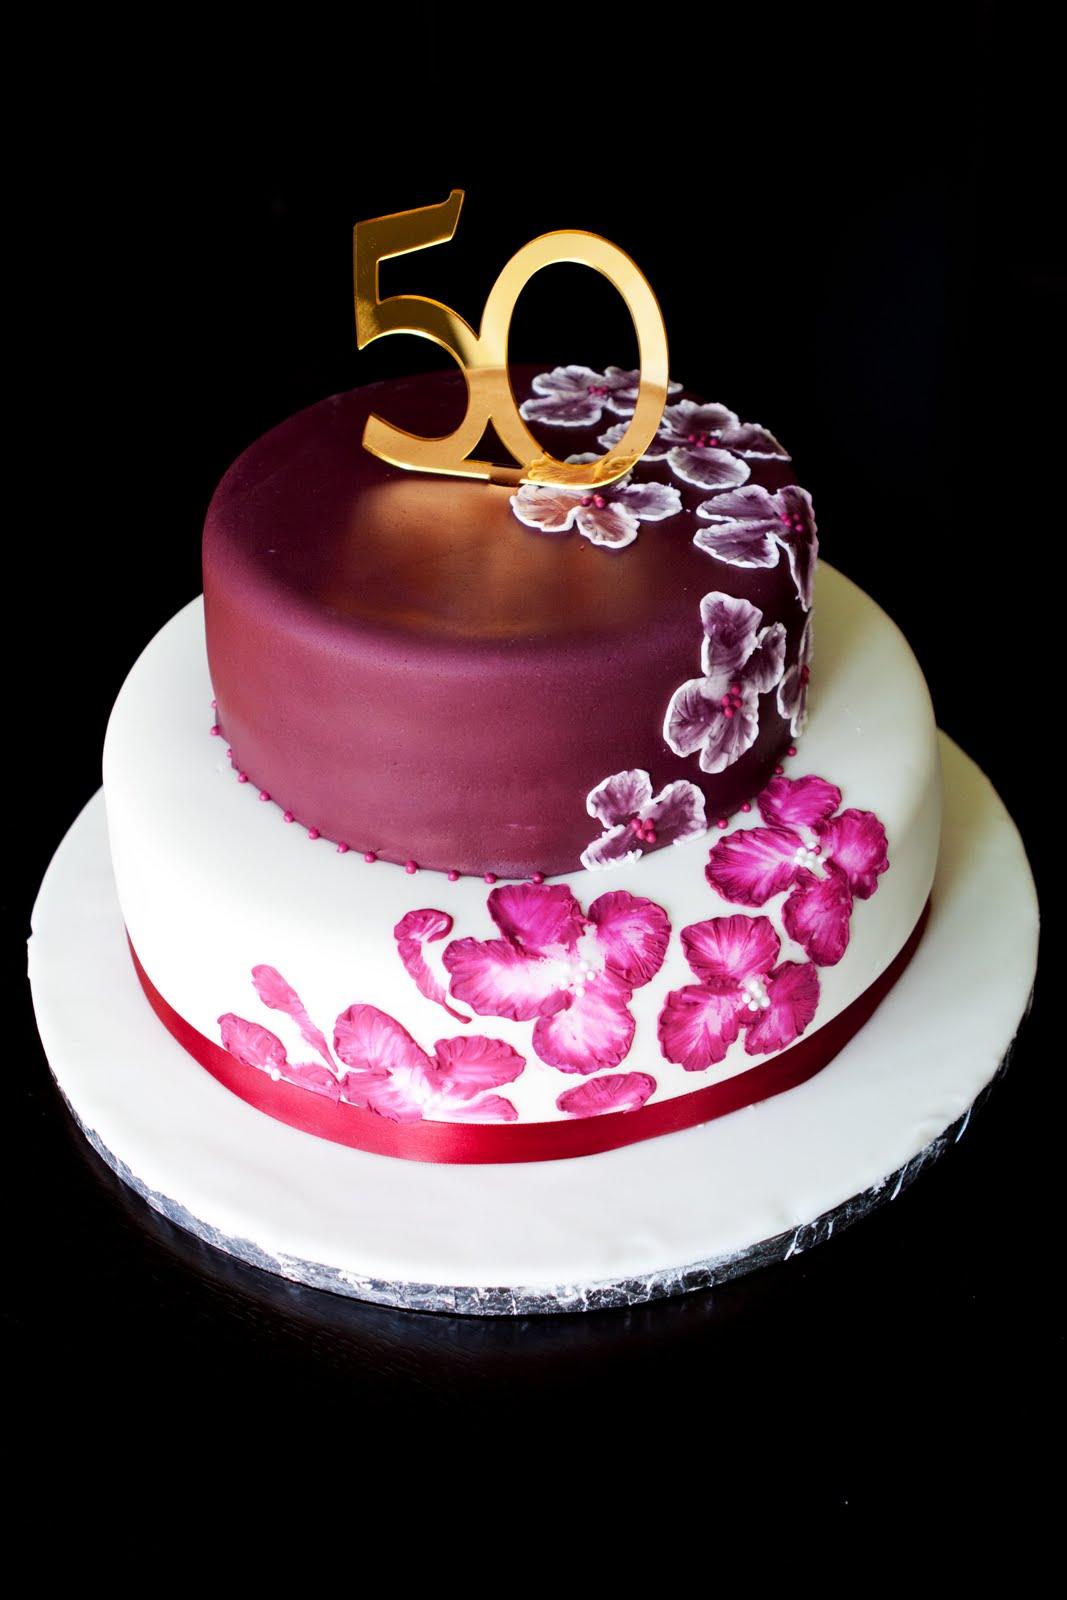 50th Birthday Cake Ideas » Elegant 50th Birthday Cake Ideas